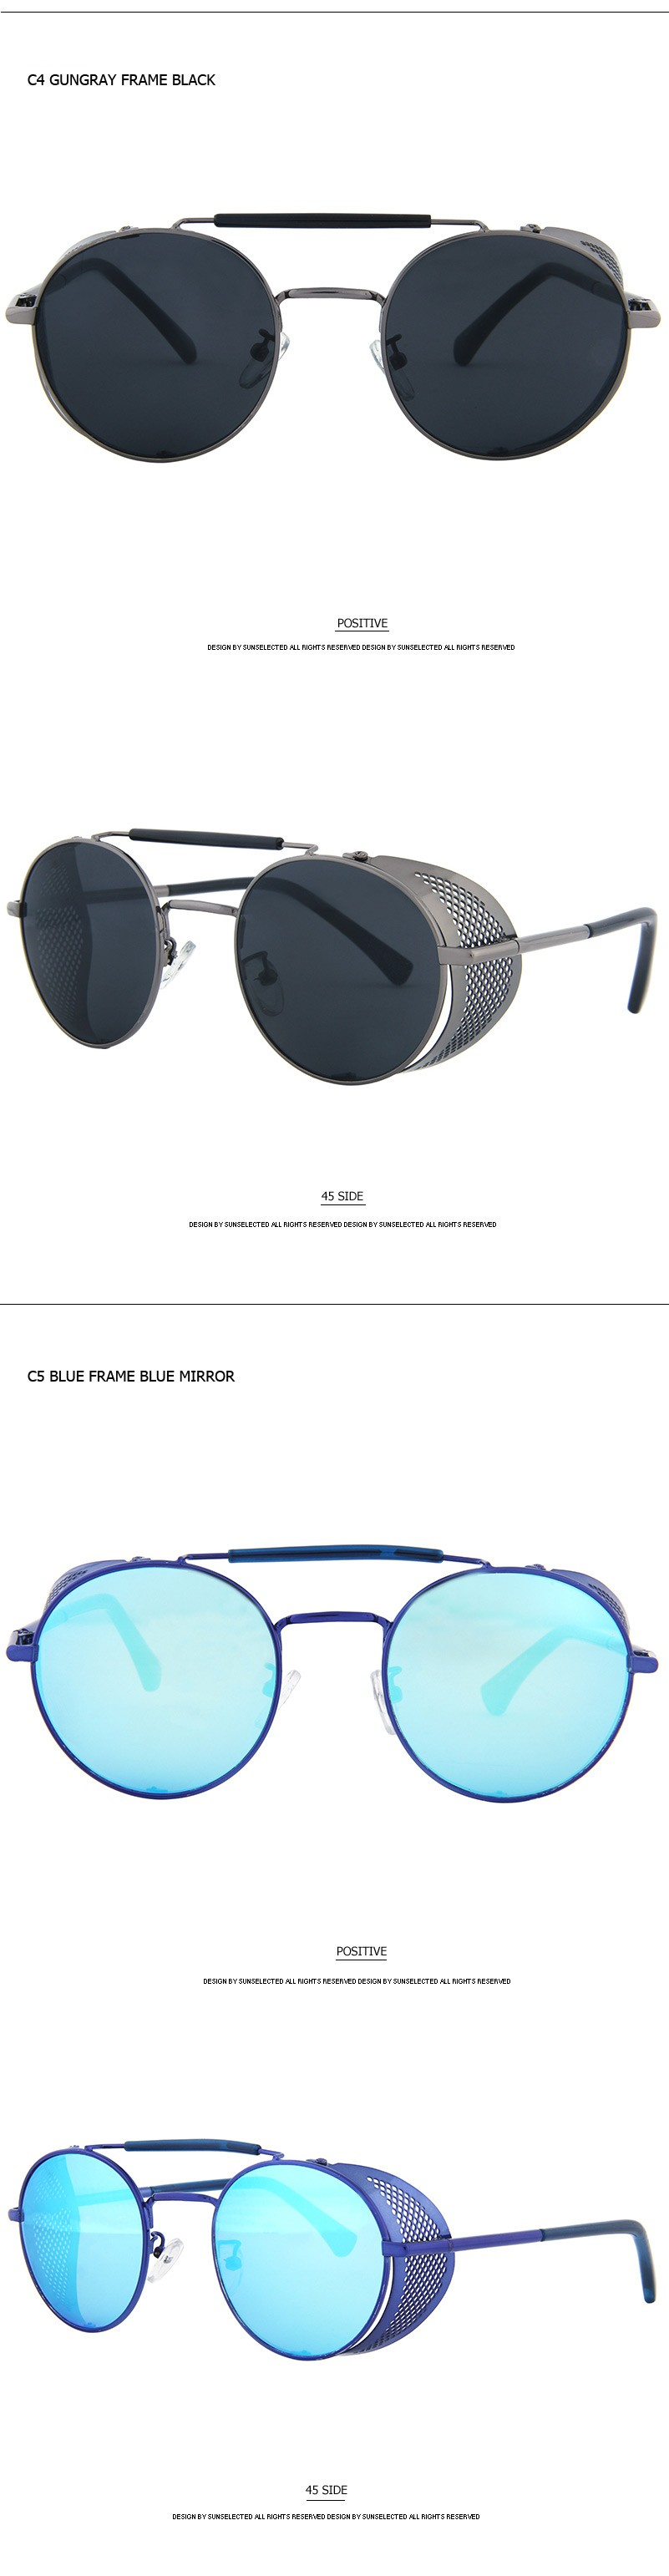 34378daeb1 GLASSES steampunk sunglasses SUNGLASSES-STEAMPUNK-WOMEN SUNGLASSES-STEAMPUNK-WOMEN-  SUNGLASSES-STEAMPUNK-MEN- ...